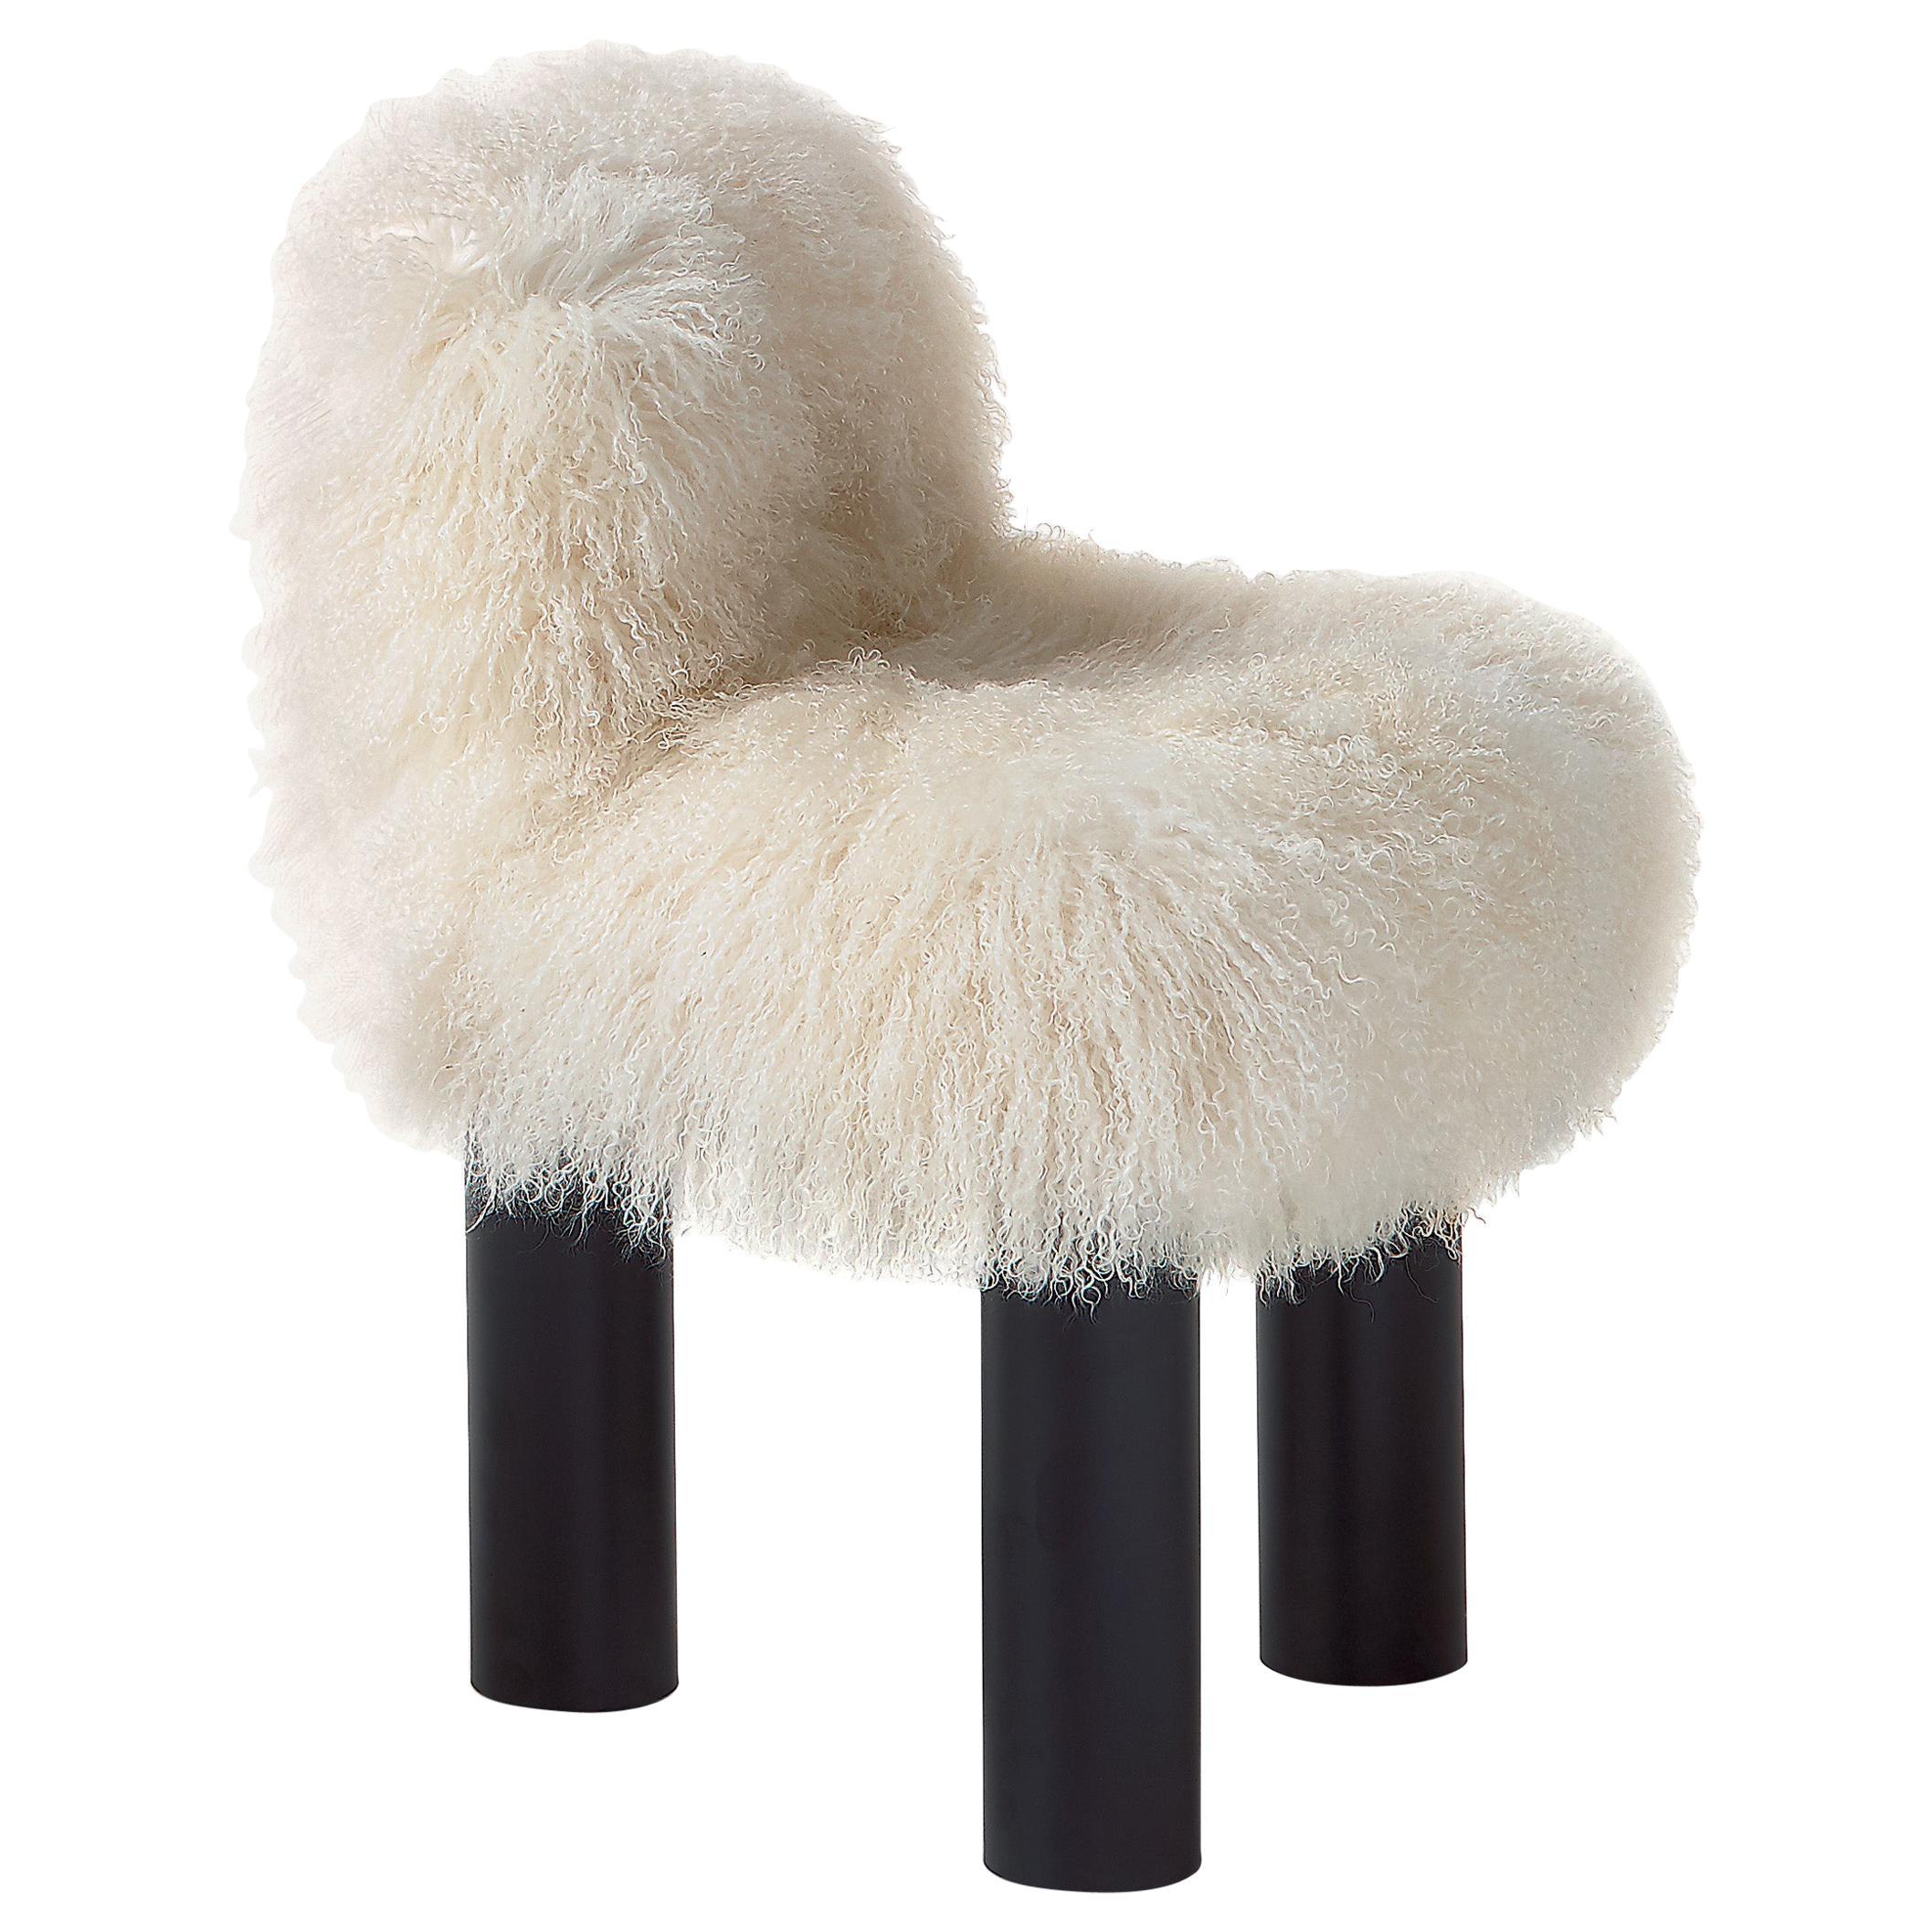 Arflex Botolo High Back Armchair in Natural Fur & Black Metal Legs by Cini Boeri